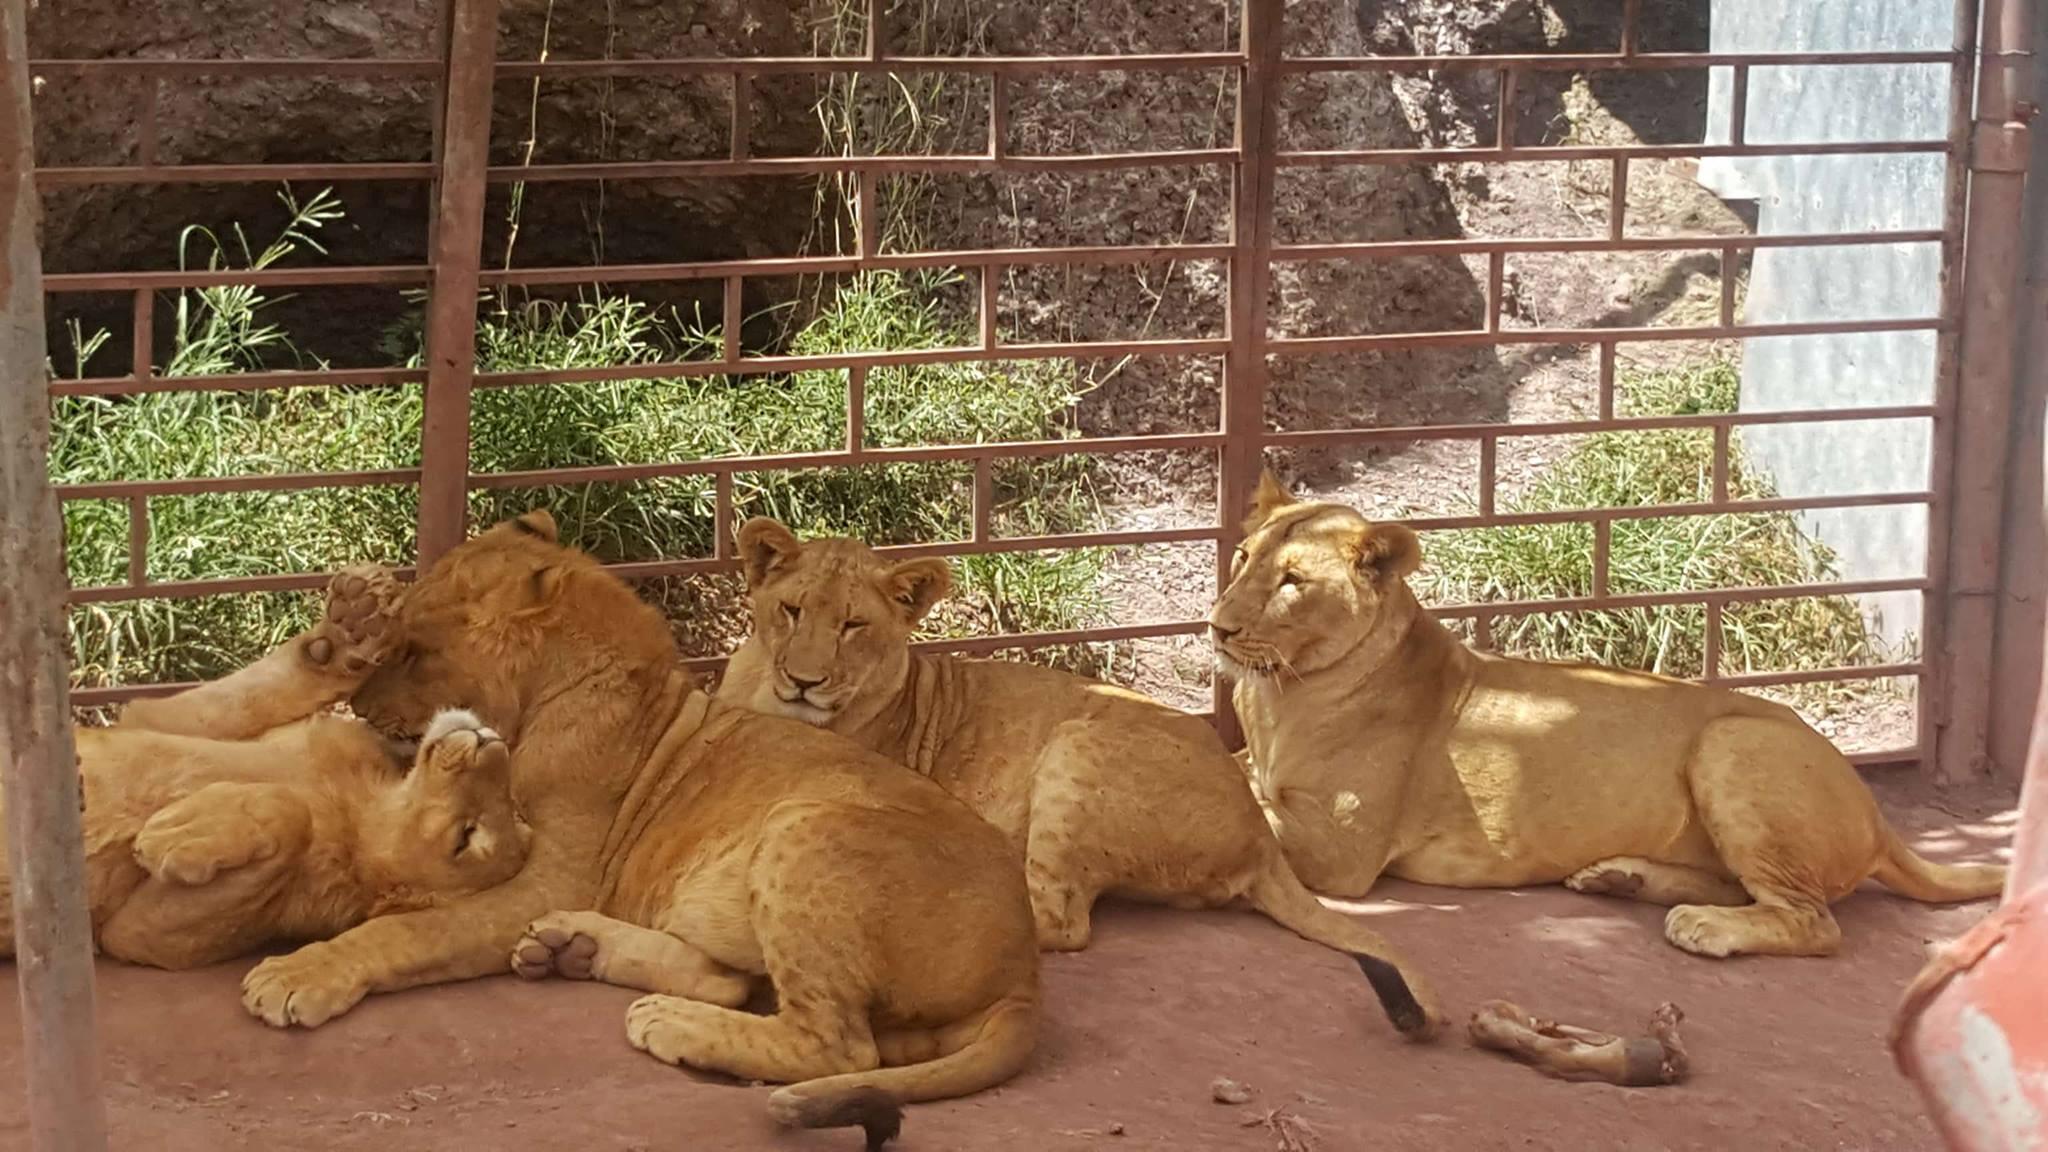 Ibb zoo lions sunny side safe 13 Oct 2017 Salmans pics OWAP-AR.jpg